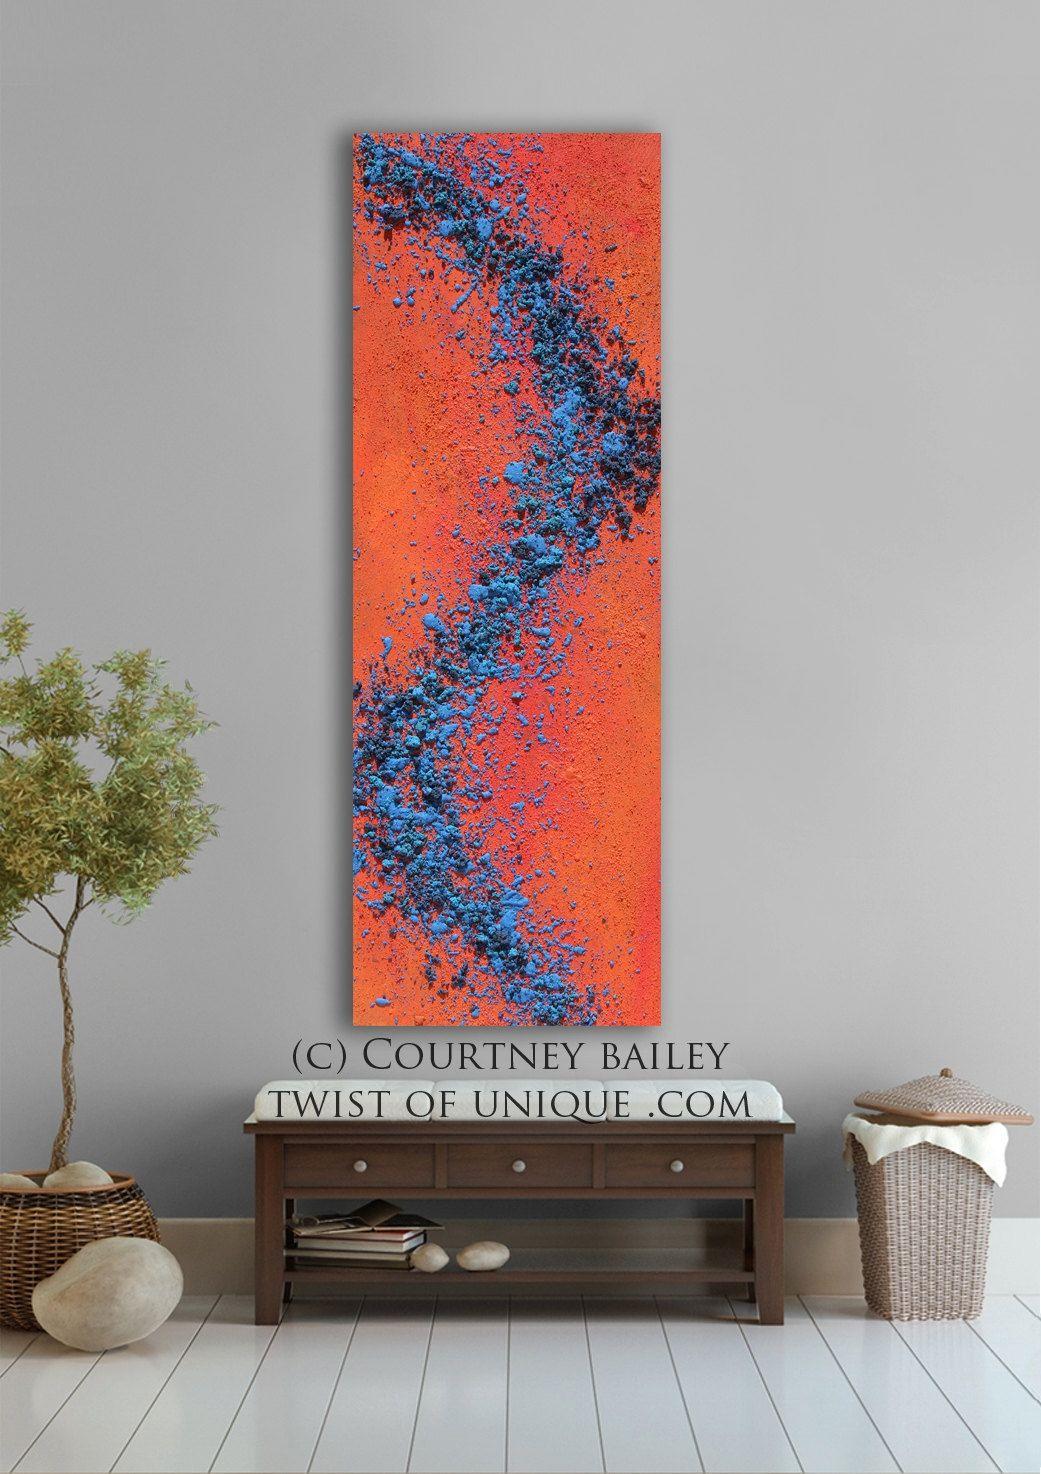 vivid abstract artwork, Large Original Abstract painting, Large abstract wall art, abstract home wall decor, blue, Orange, Red-Orange, Blue.